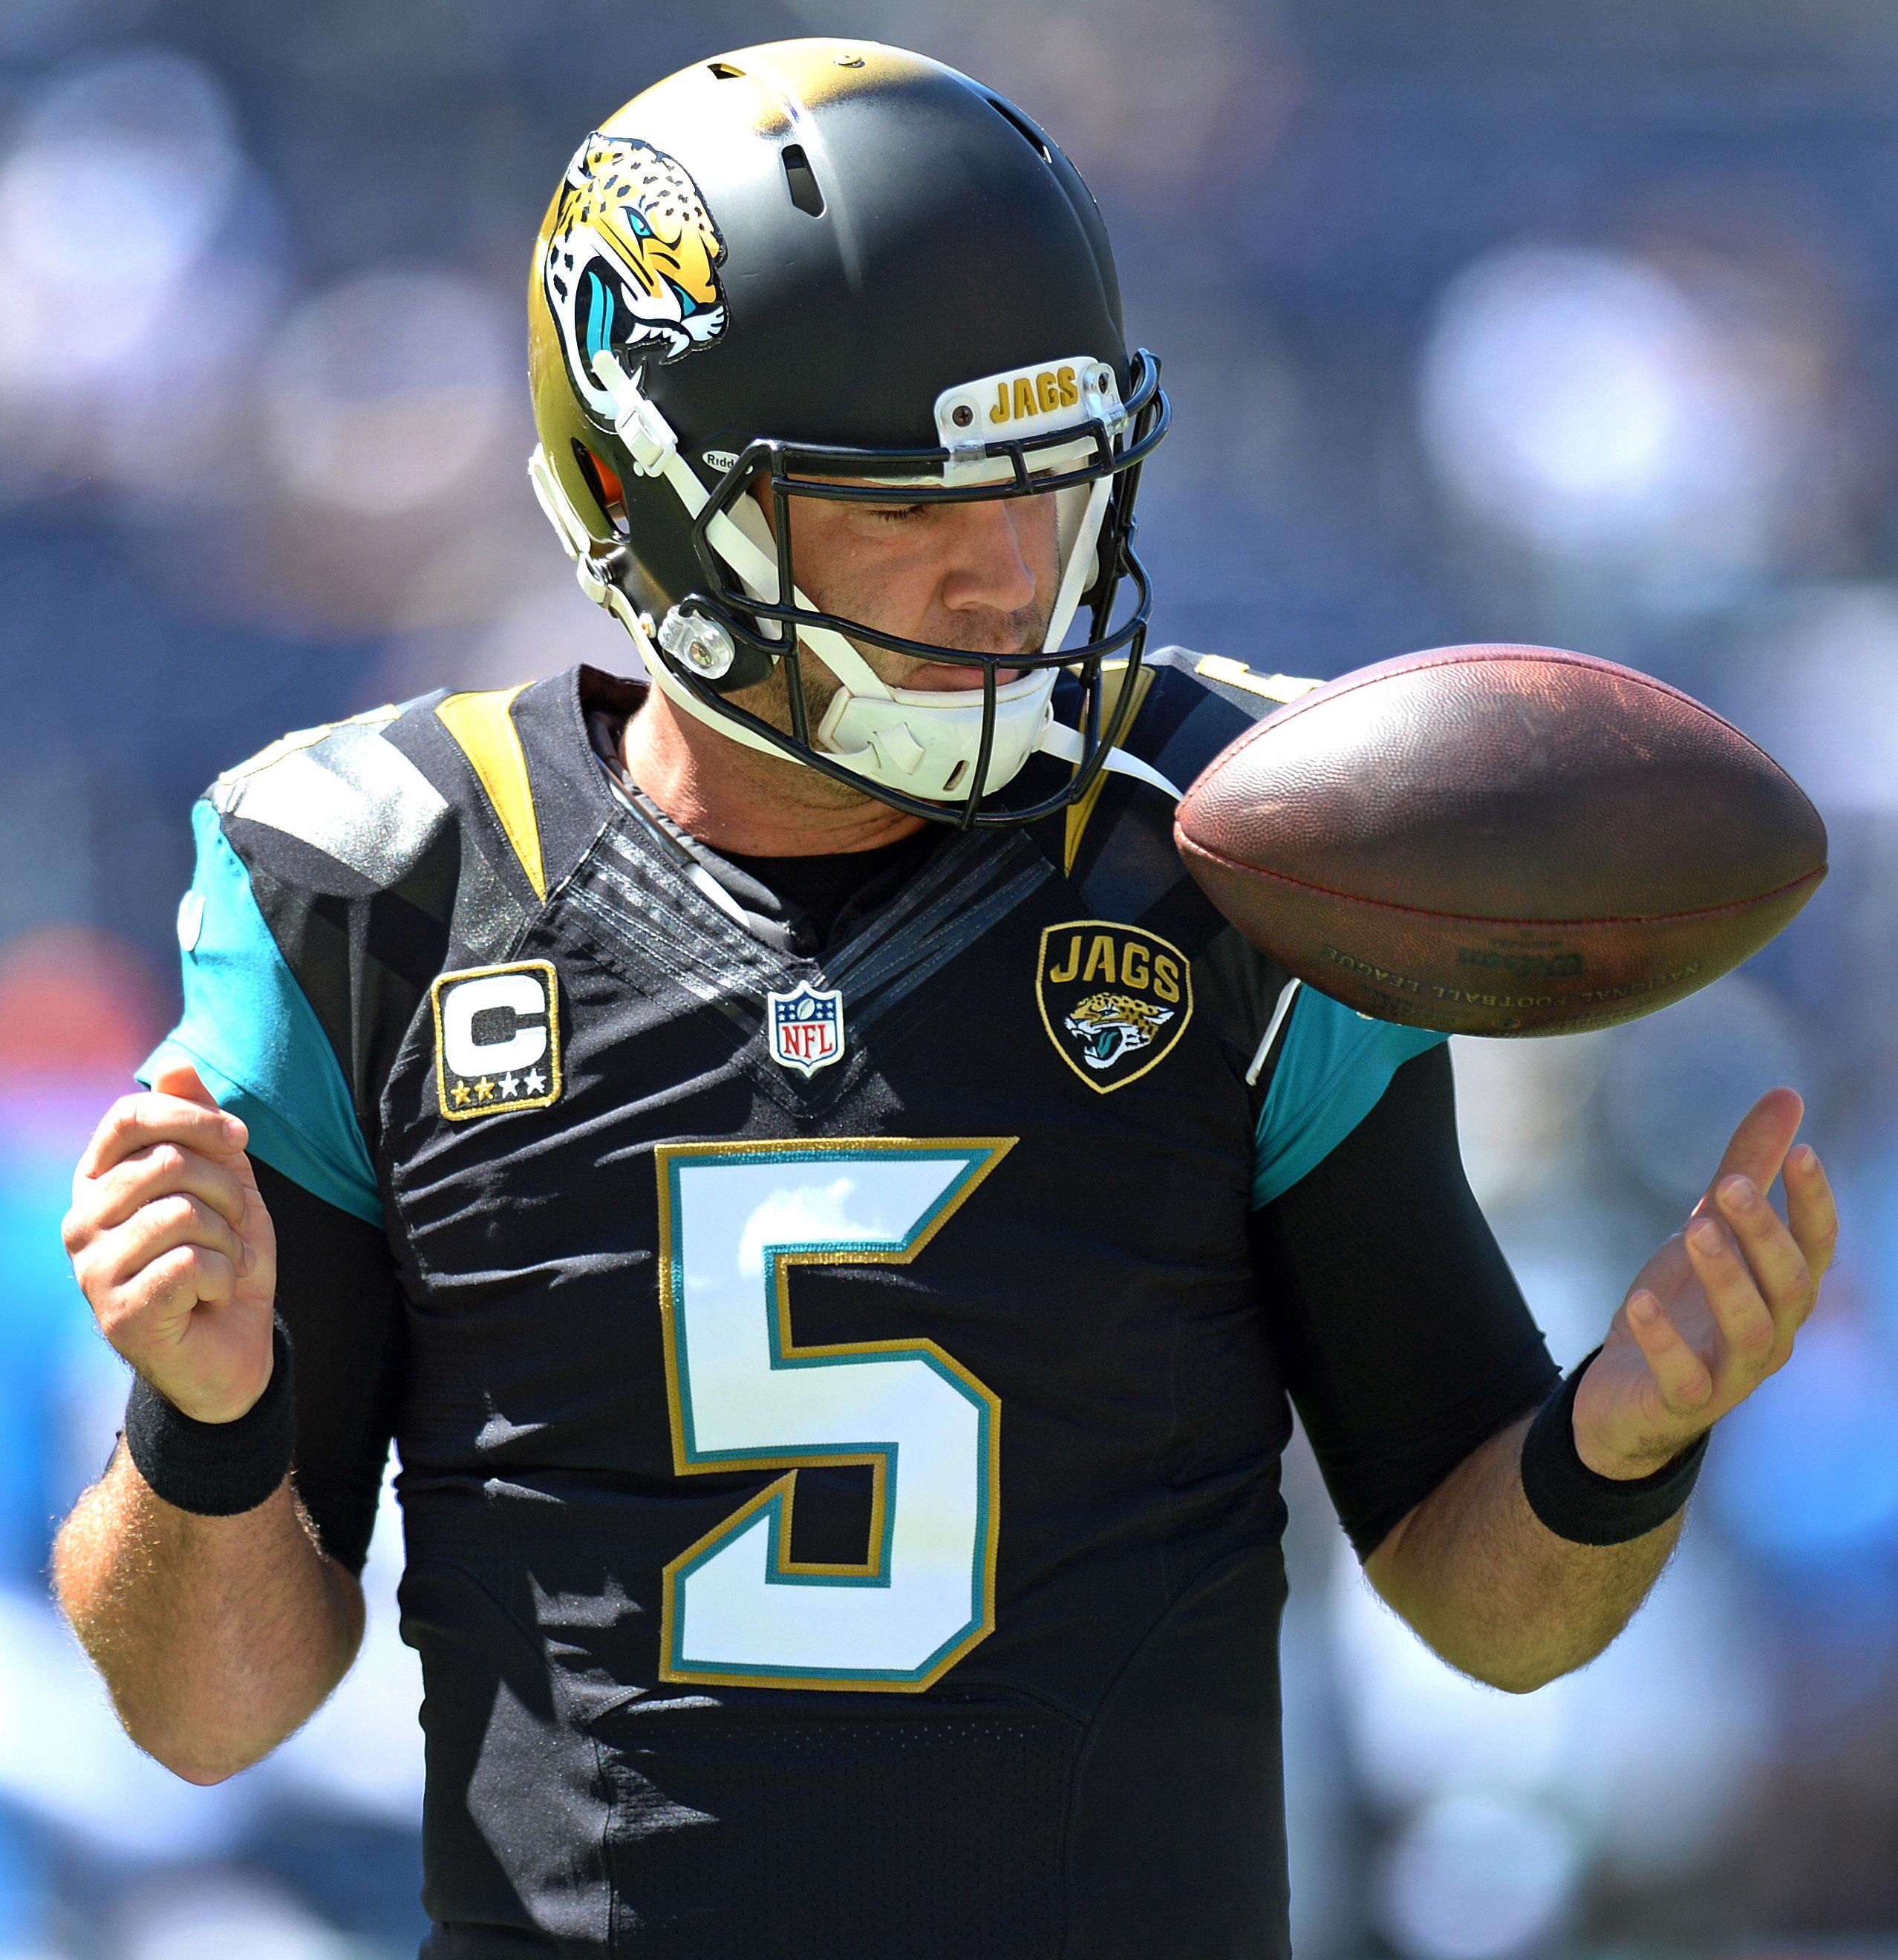 jaguars jacksonville quarterback nfl quarterbacks draft greatest diego san bortles blake today fan chargers usa